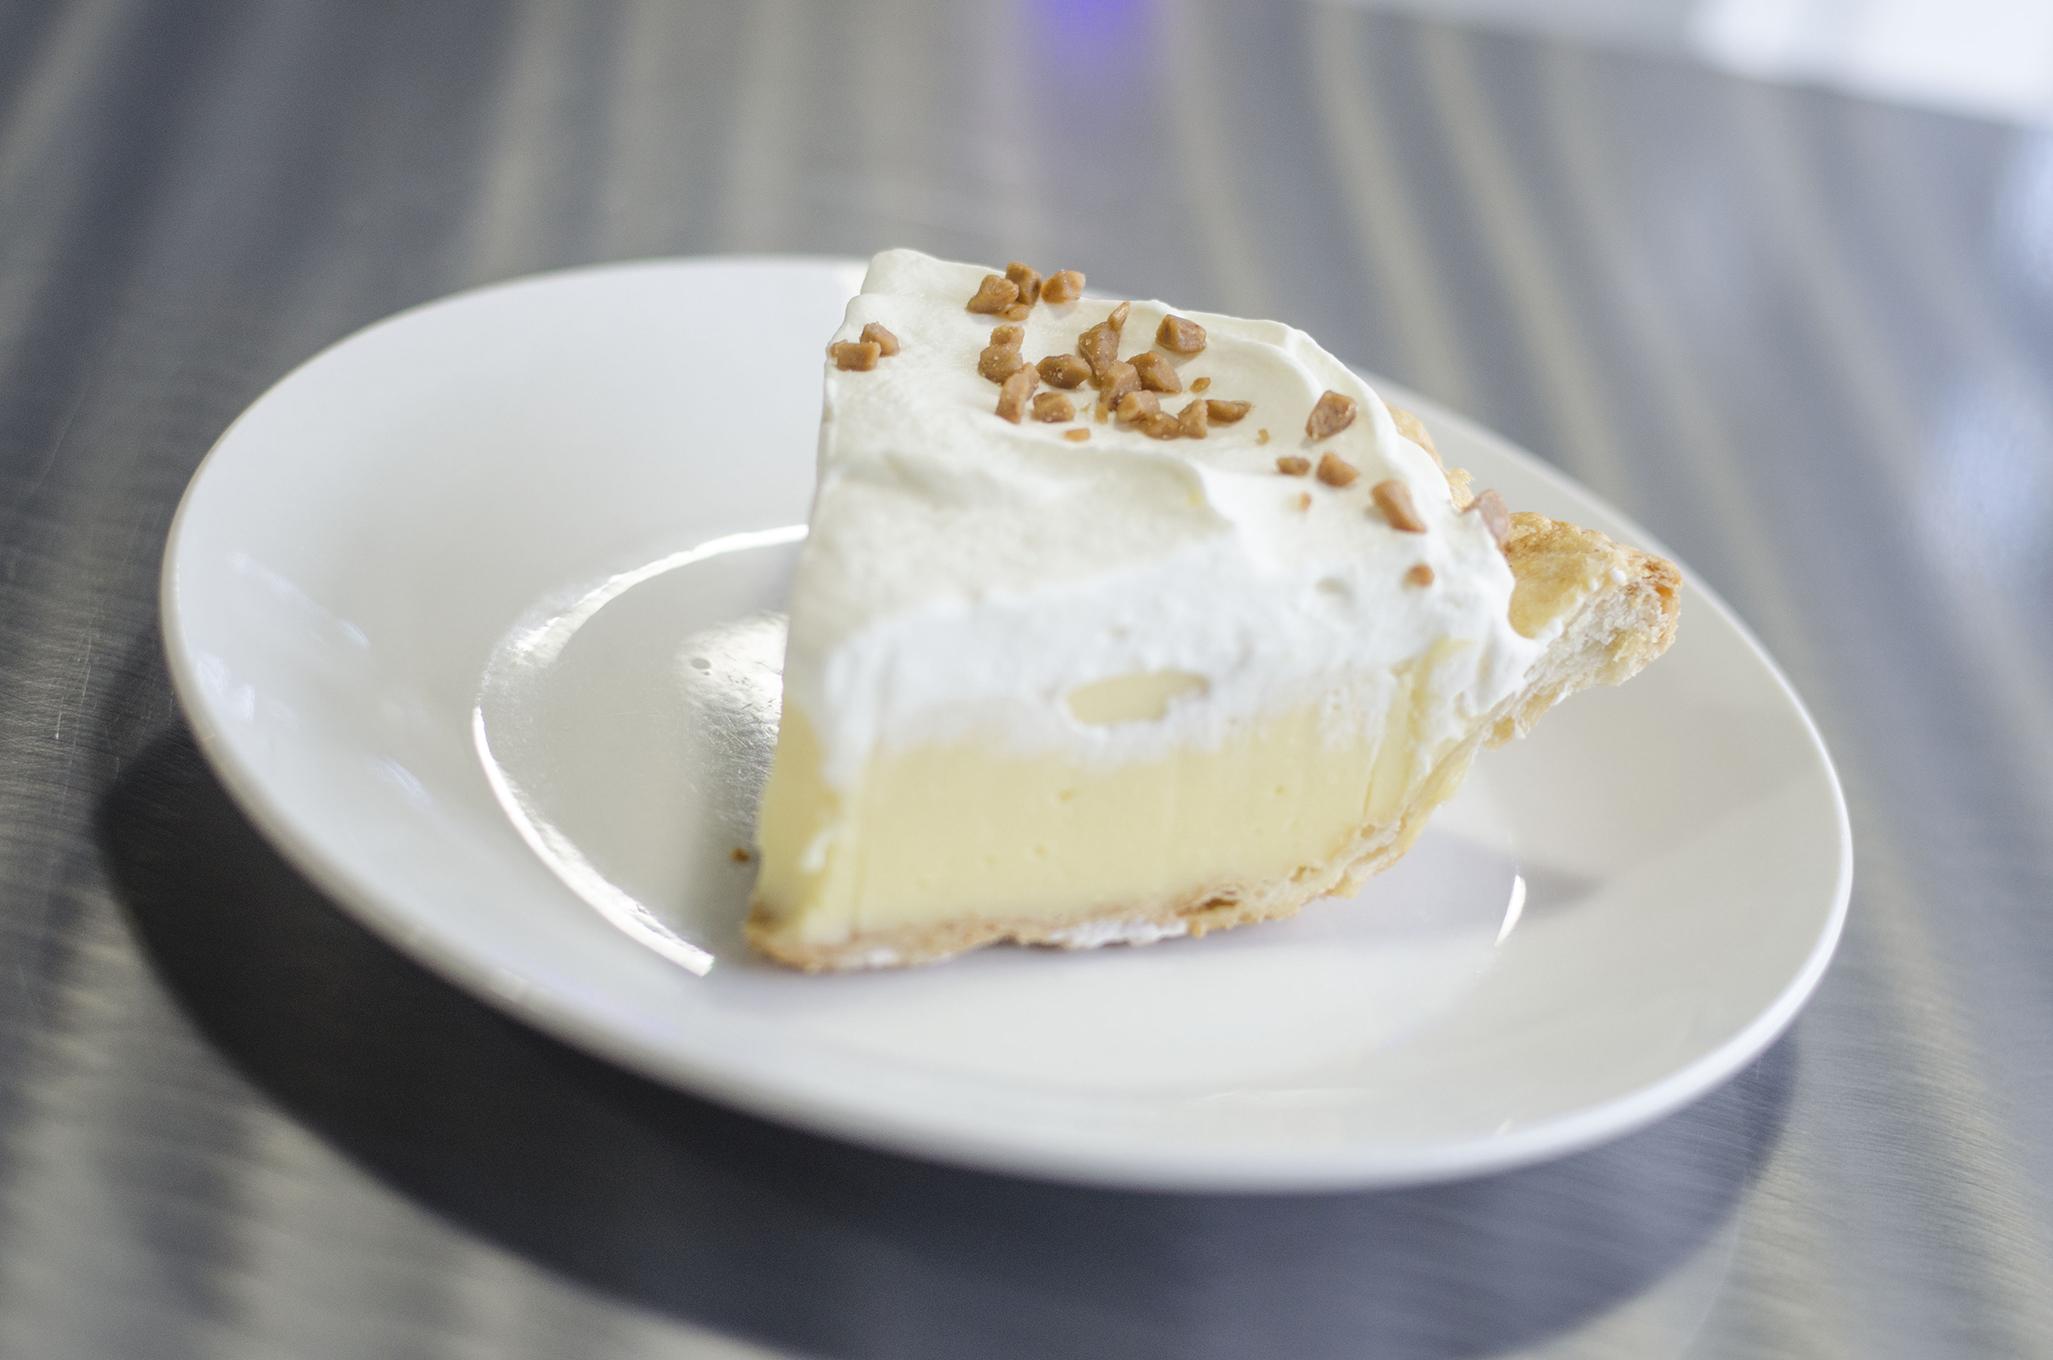 Buttered Rum Cream Pie from Riverside Pie Cafe in Windsor, Ontario.